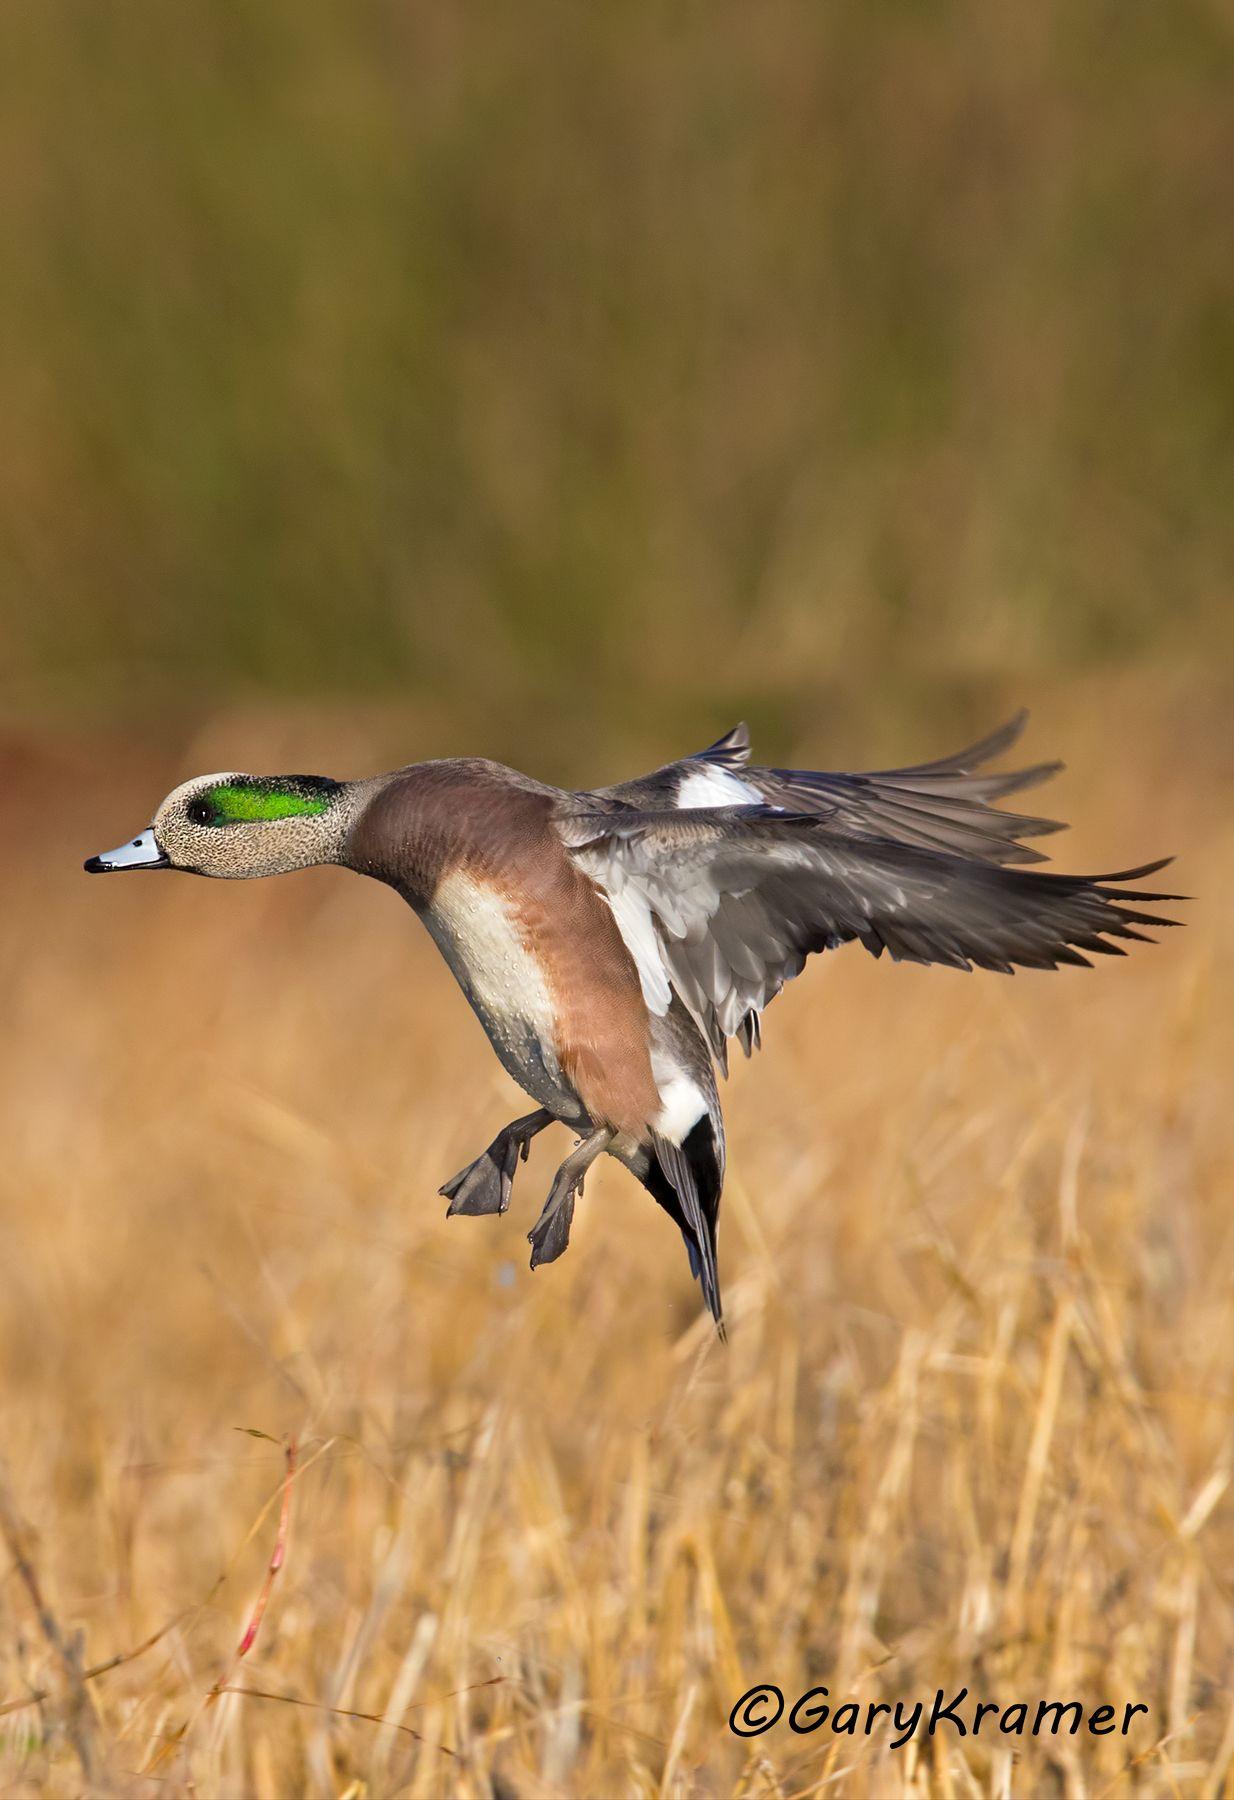 American Wigeon (Anas americana) - NBWW#1728d(2)